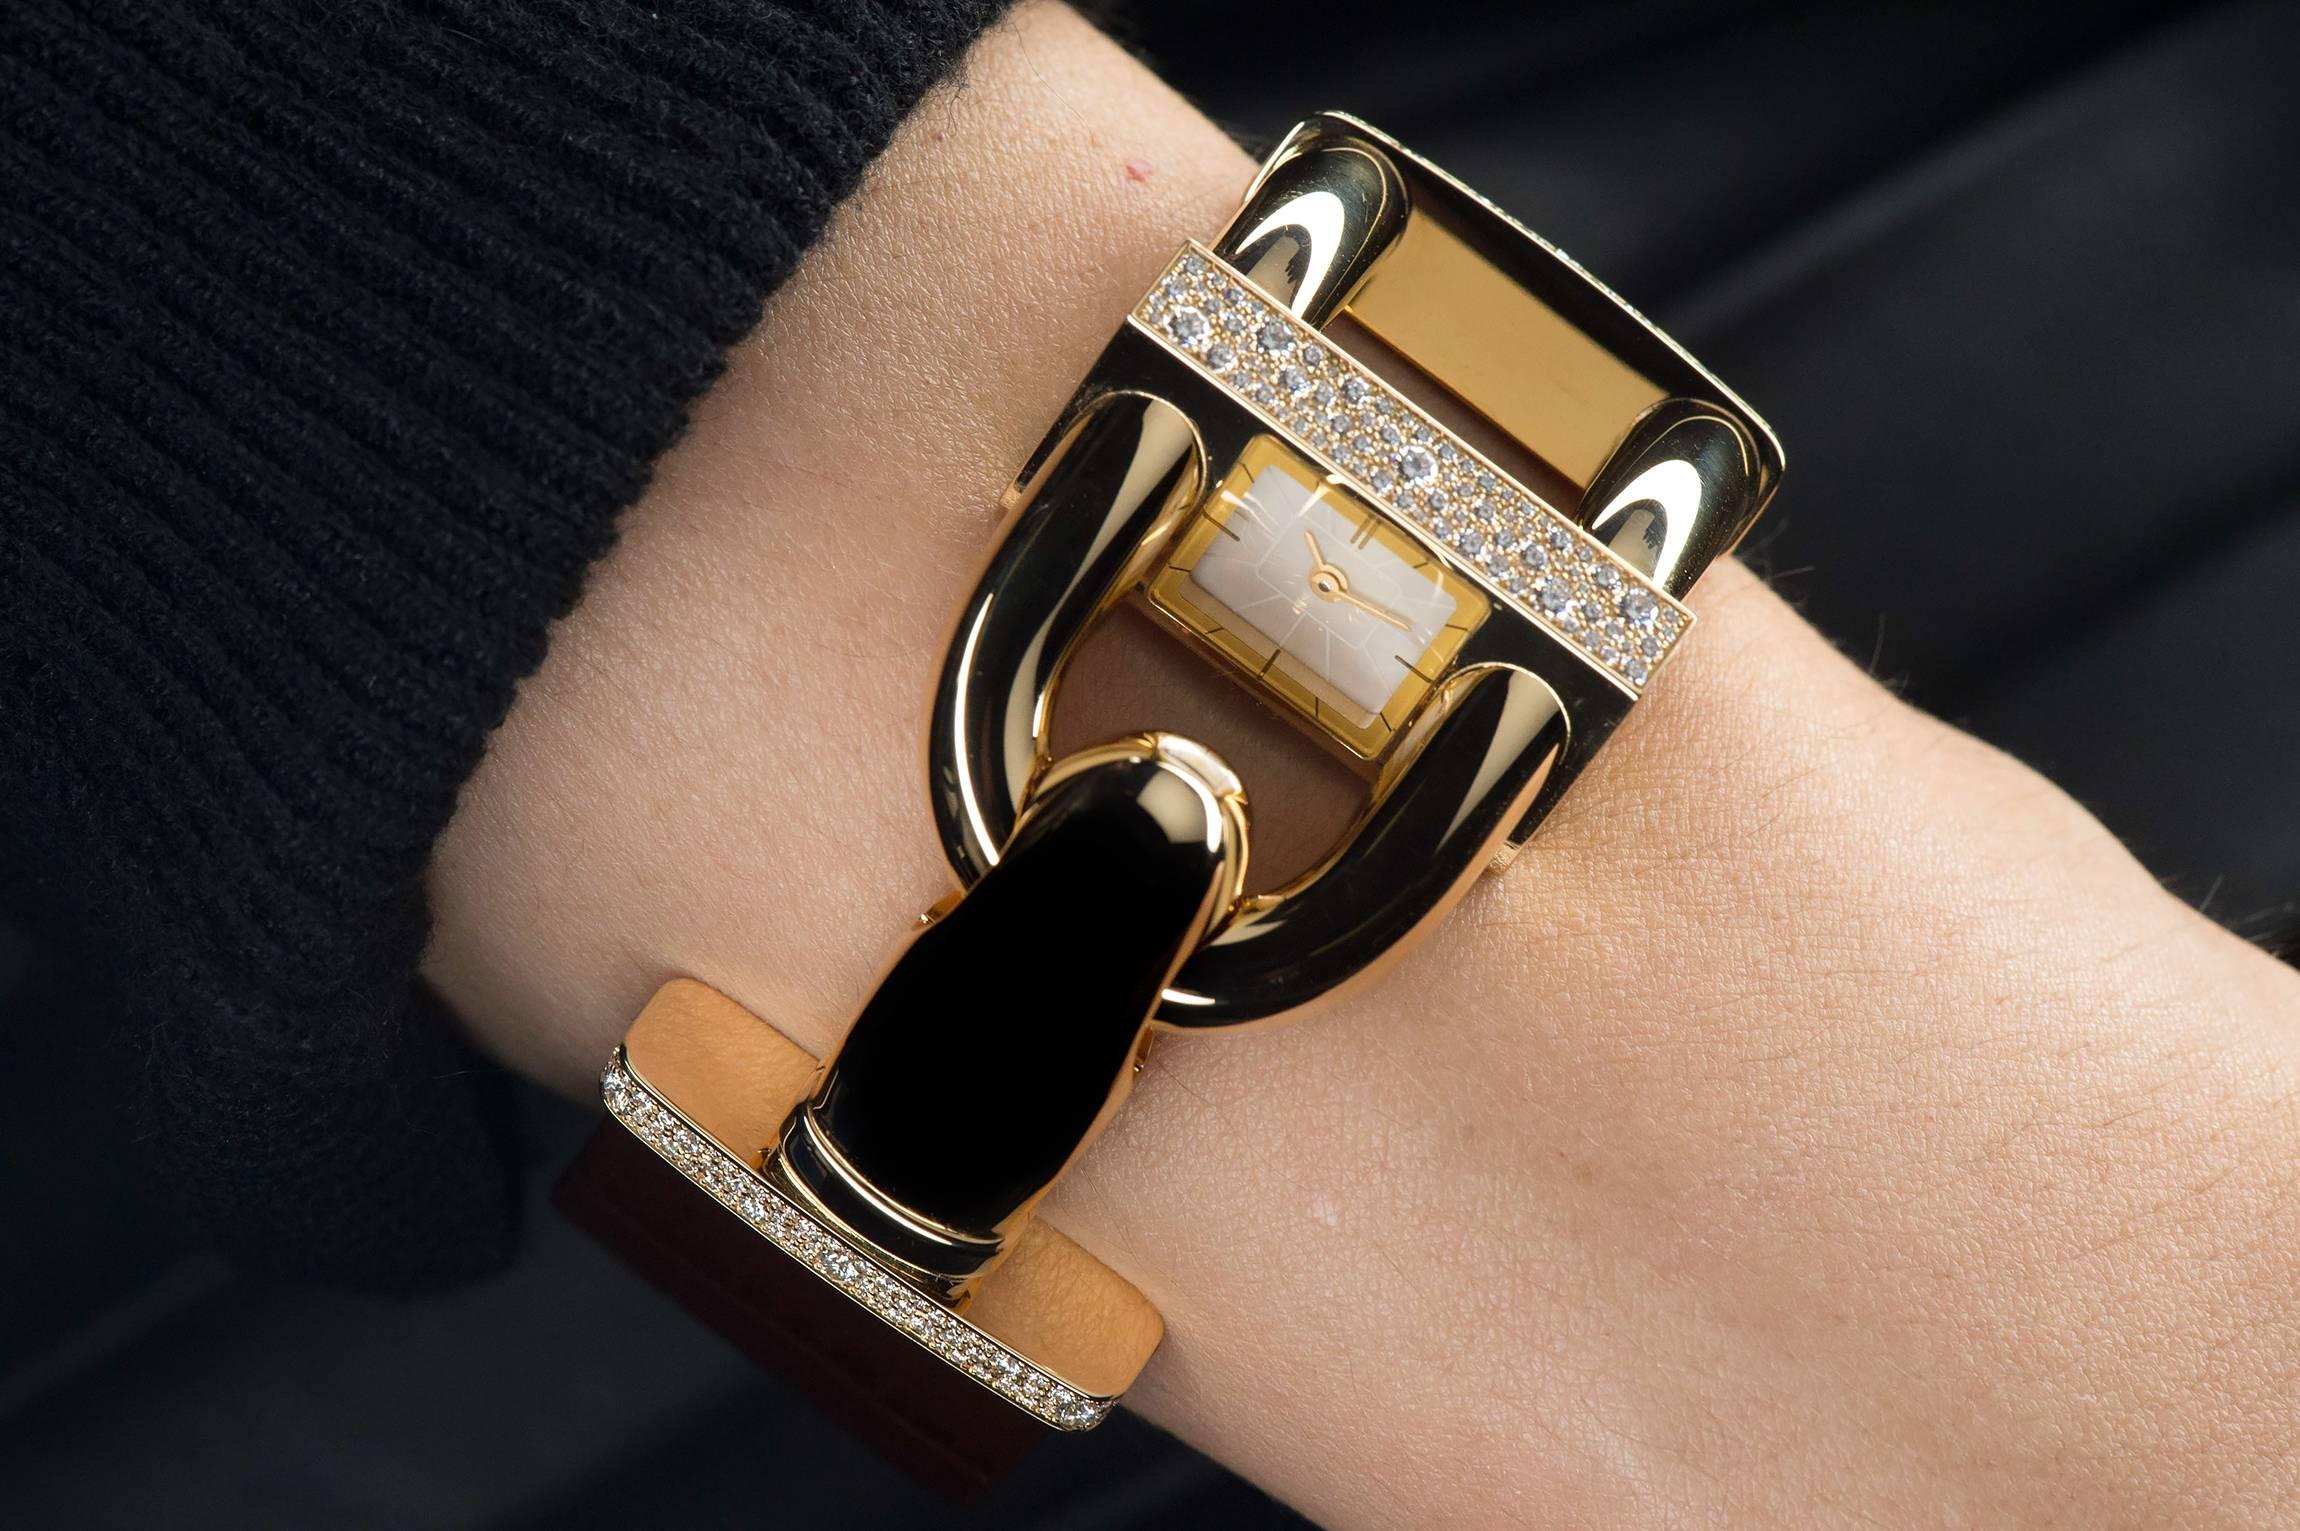 Van Cleef & Arpels Cadenas Ladies Watch 2015 Yellow Gold